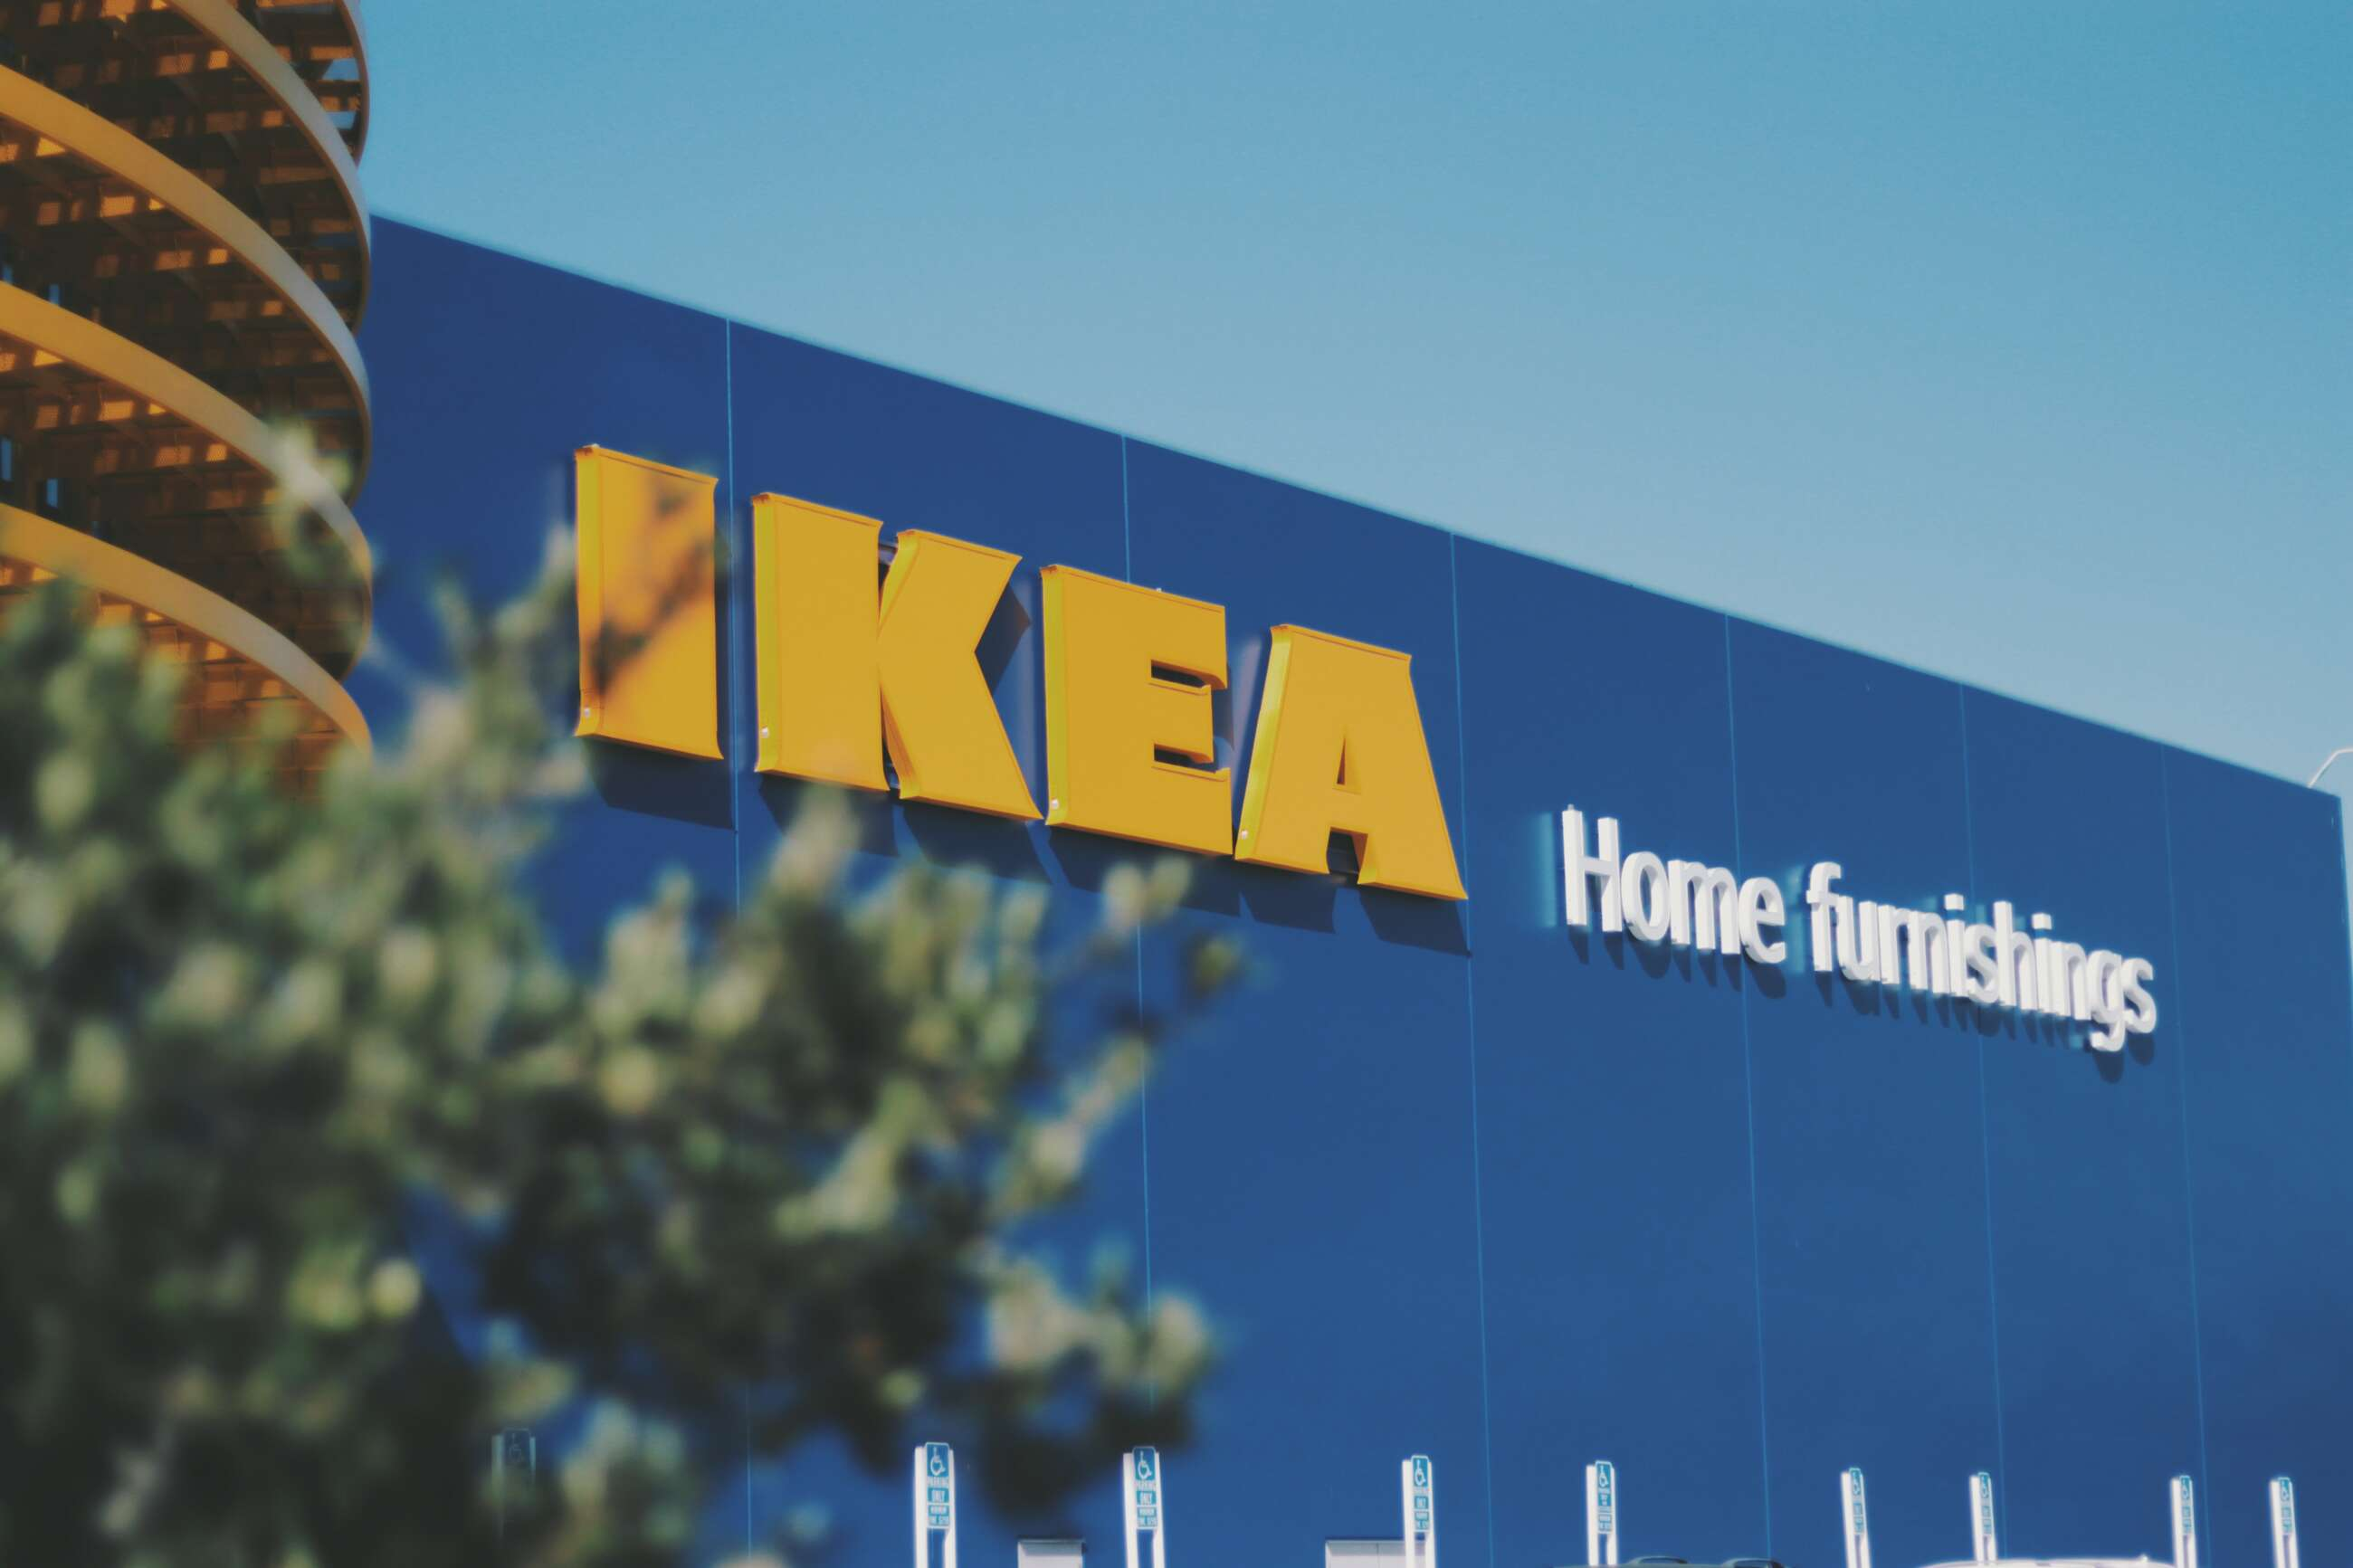 Ikea. Foto: Alexander Isreb en Pexels